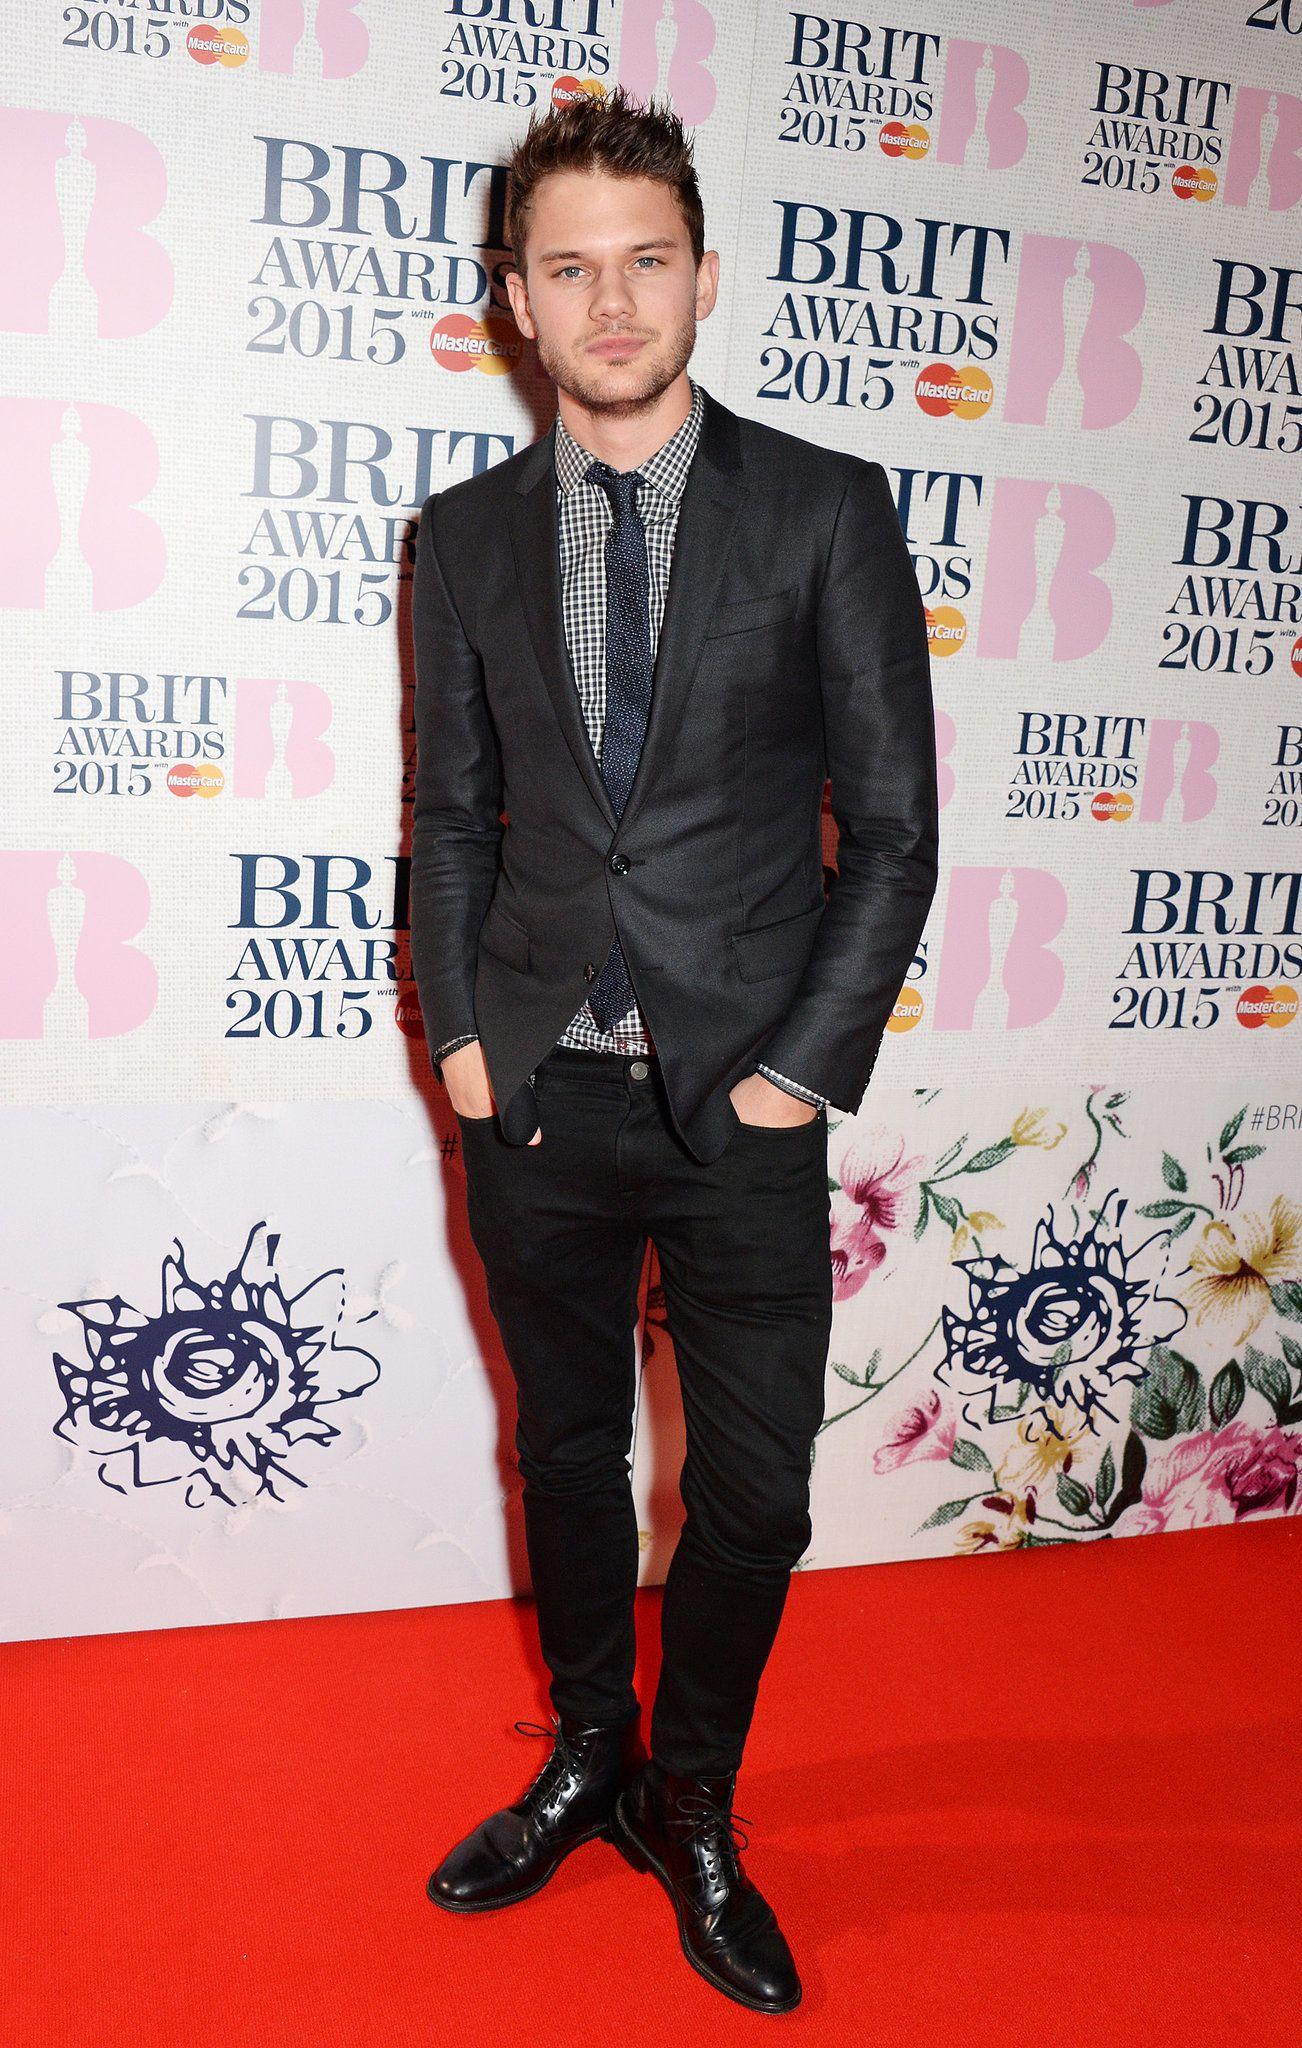 Brit Awards 2015: homens estilos no red carpet.